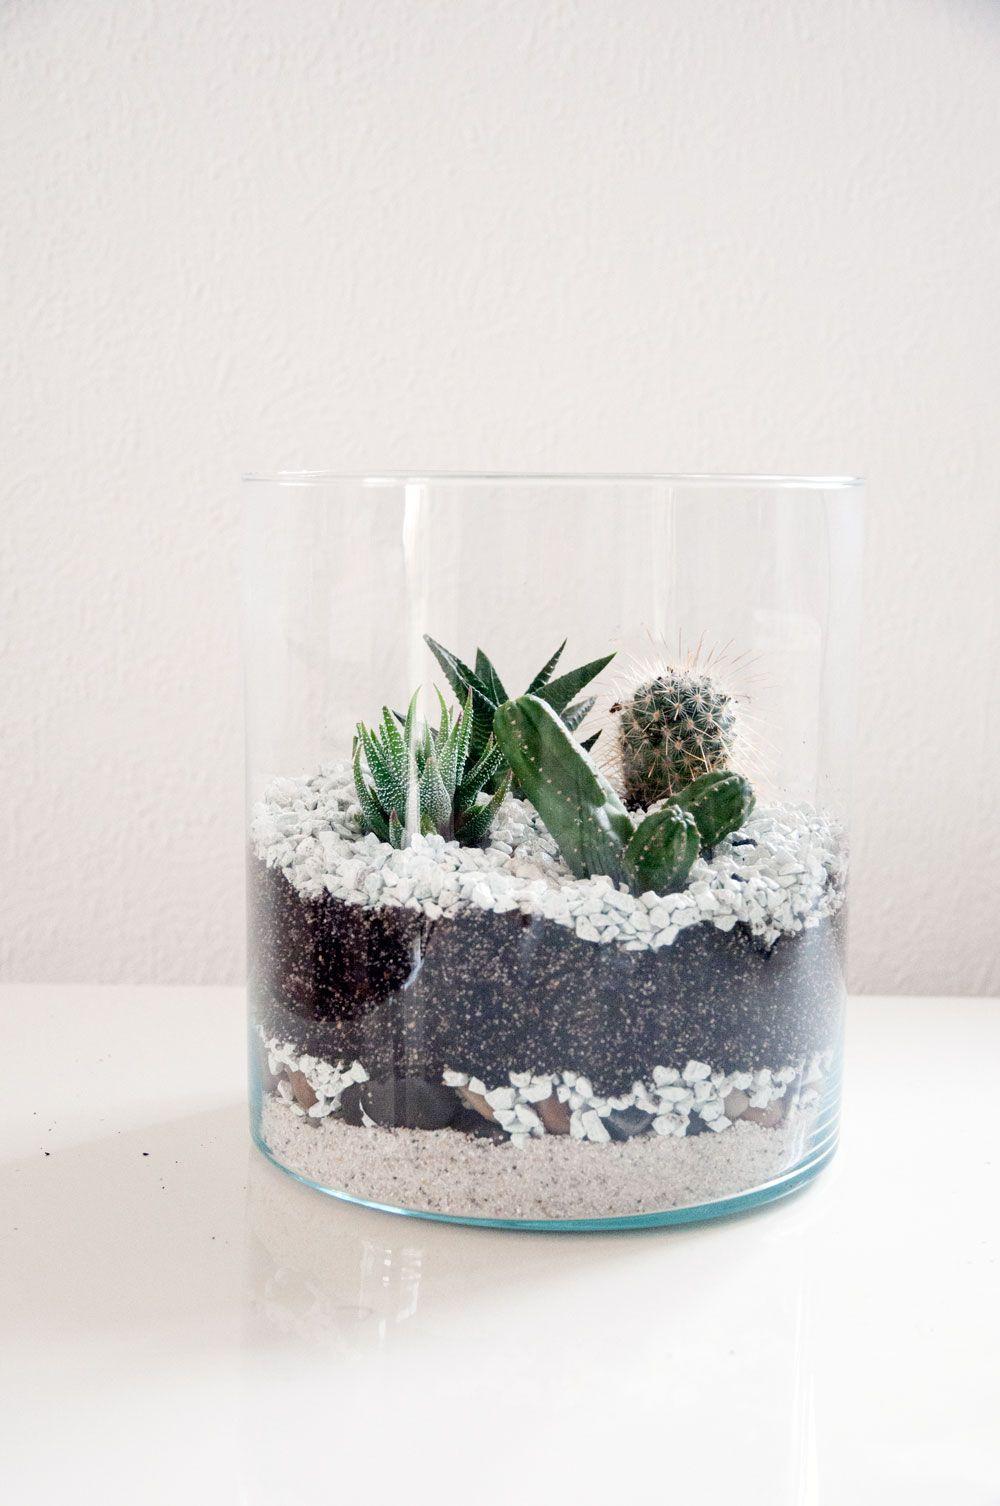 EMMALUISE | DIY Kaktus Terrarium | Http://emmaluise.com